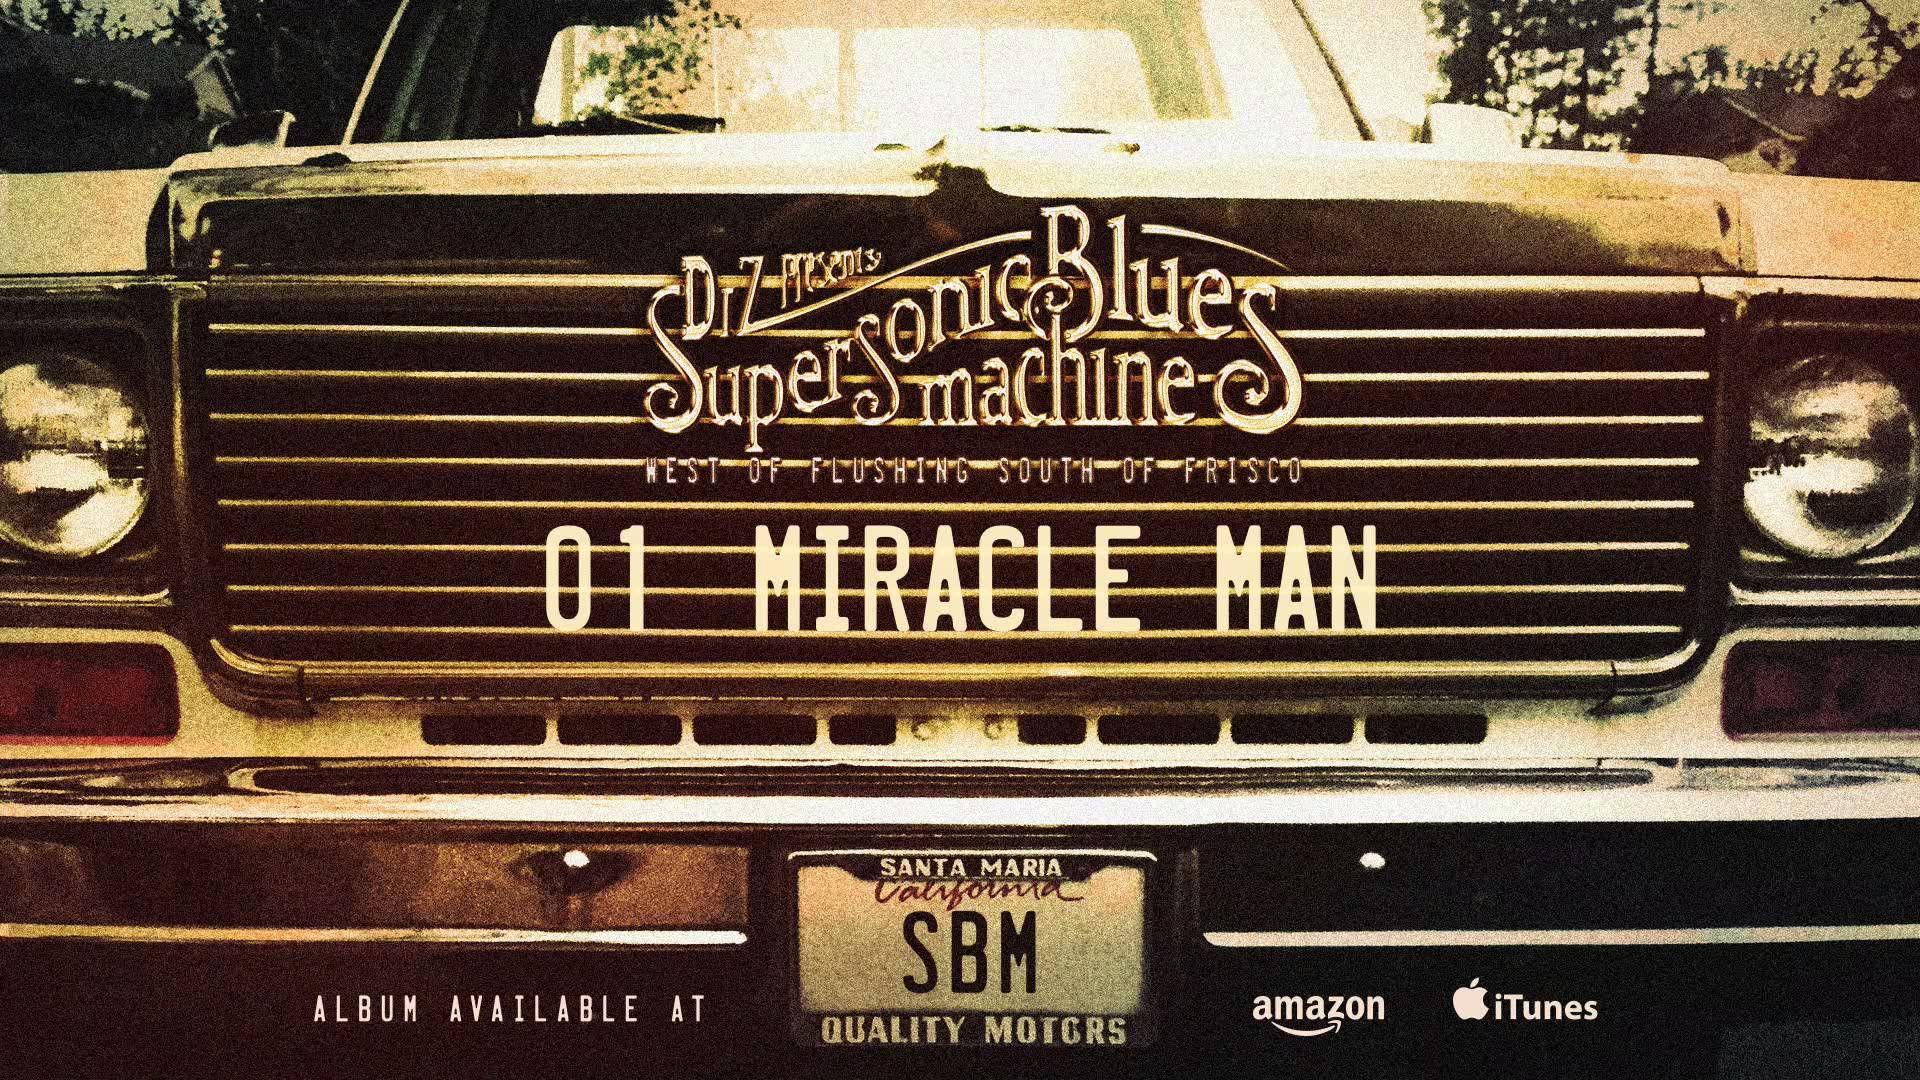 supersonic blues machine # 58